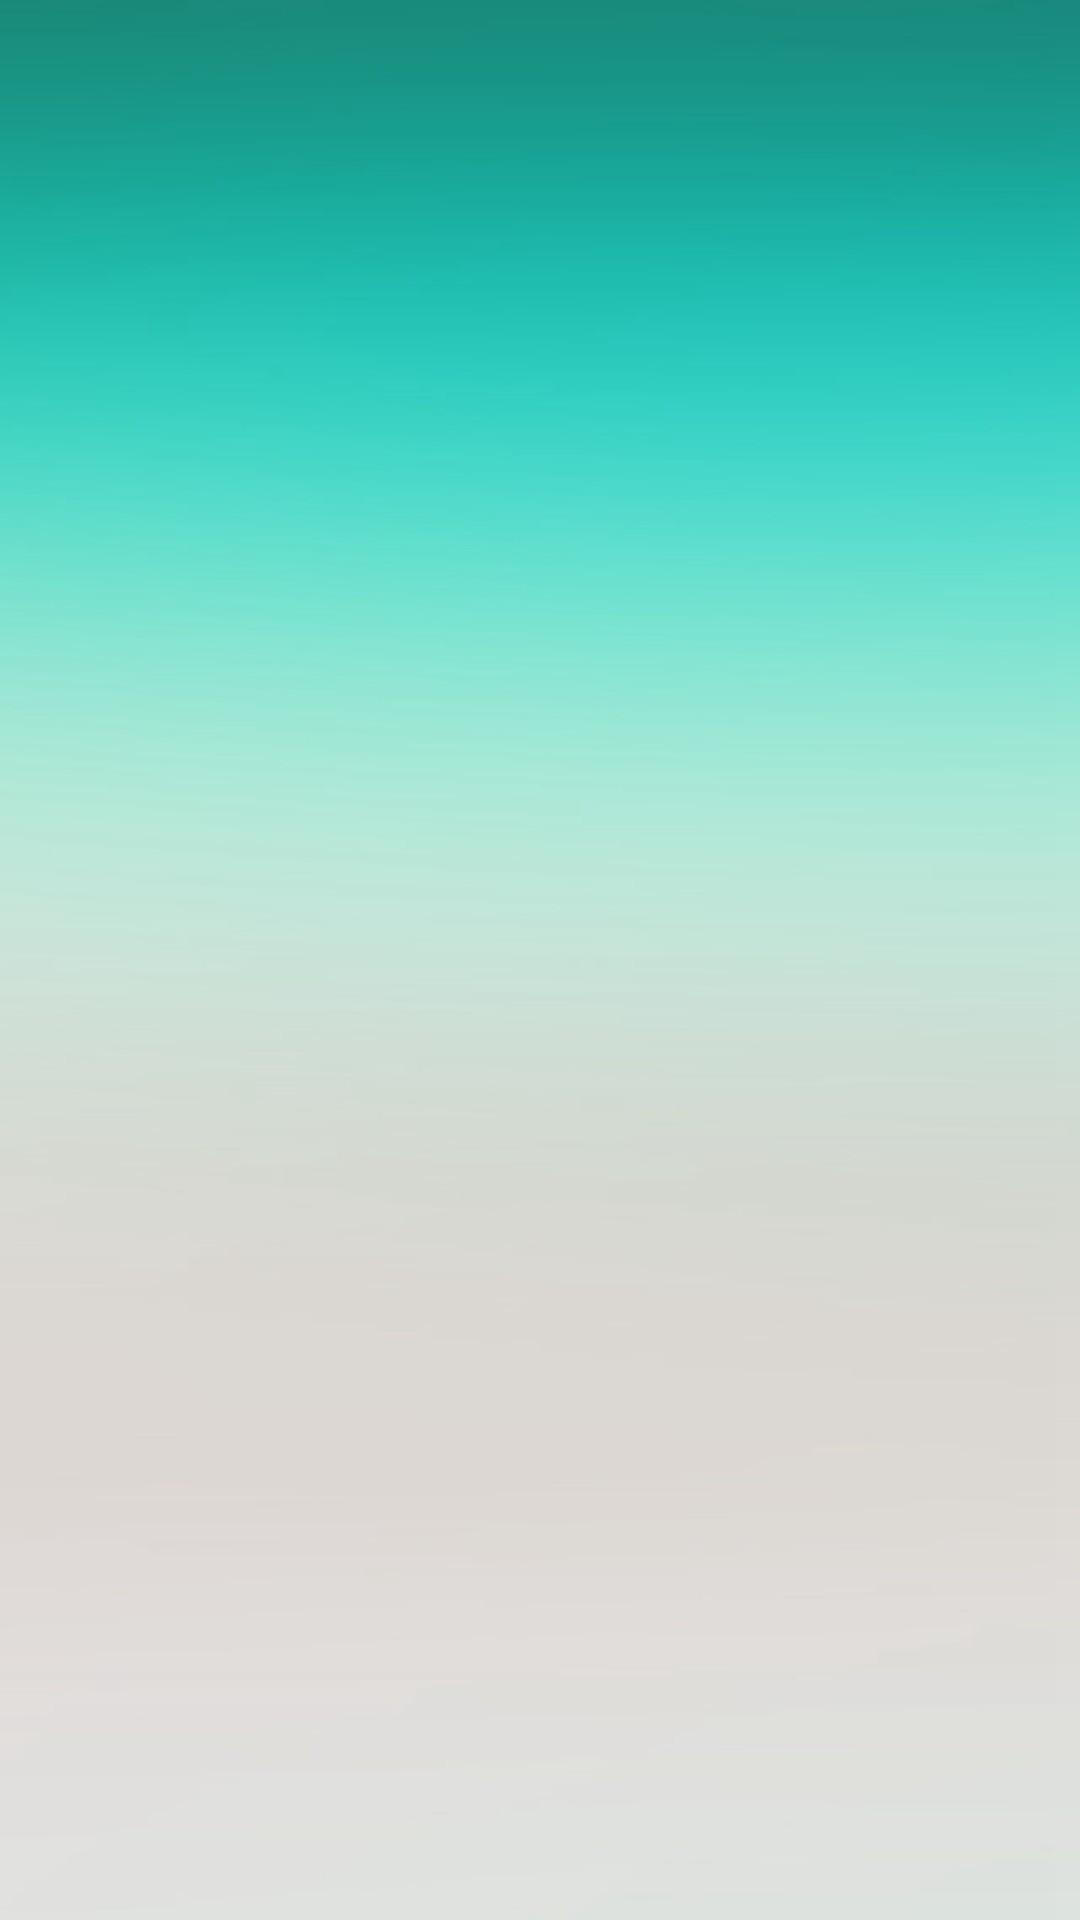 1080x1920 Sky Green Clear White Gradation Blur IPhone 6 Wallpaper